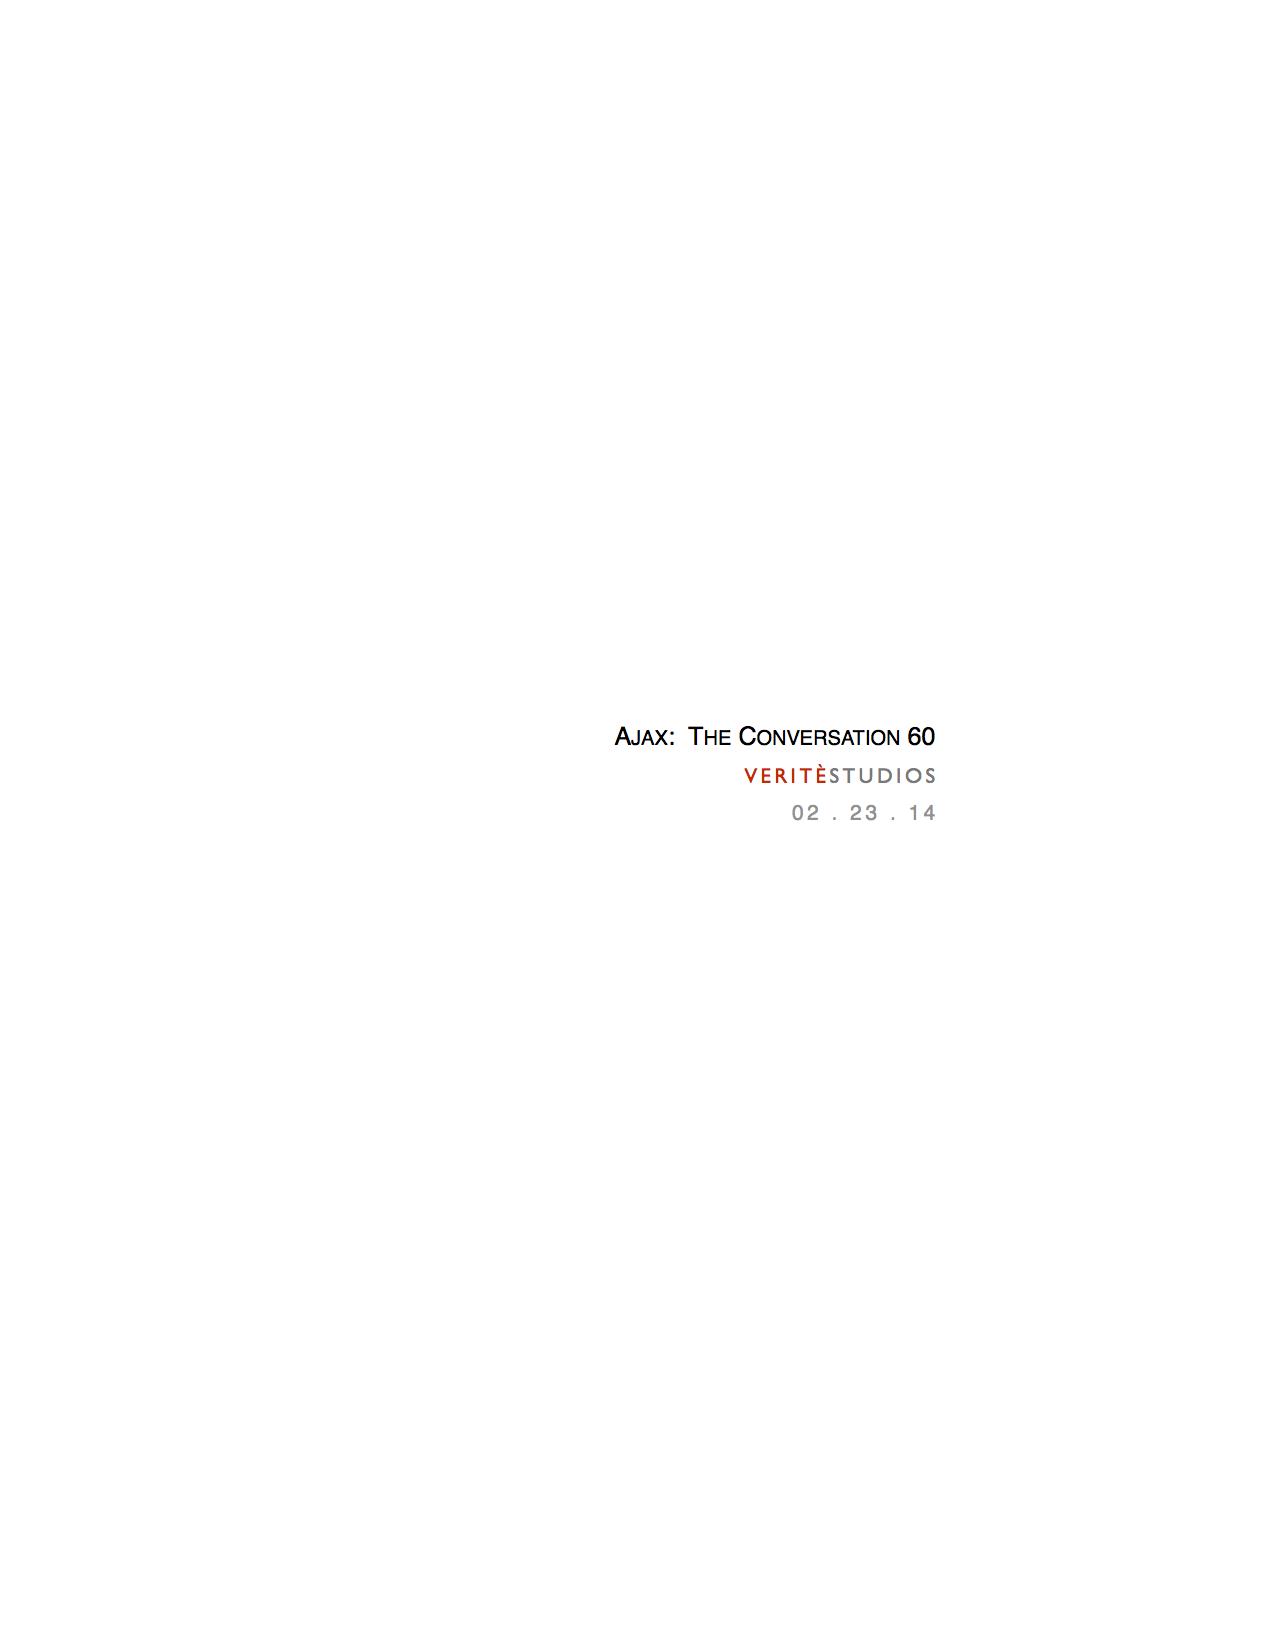 Ajax: The Conversation Script